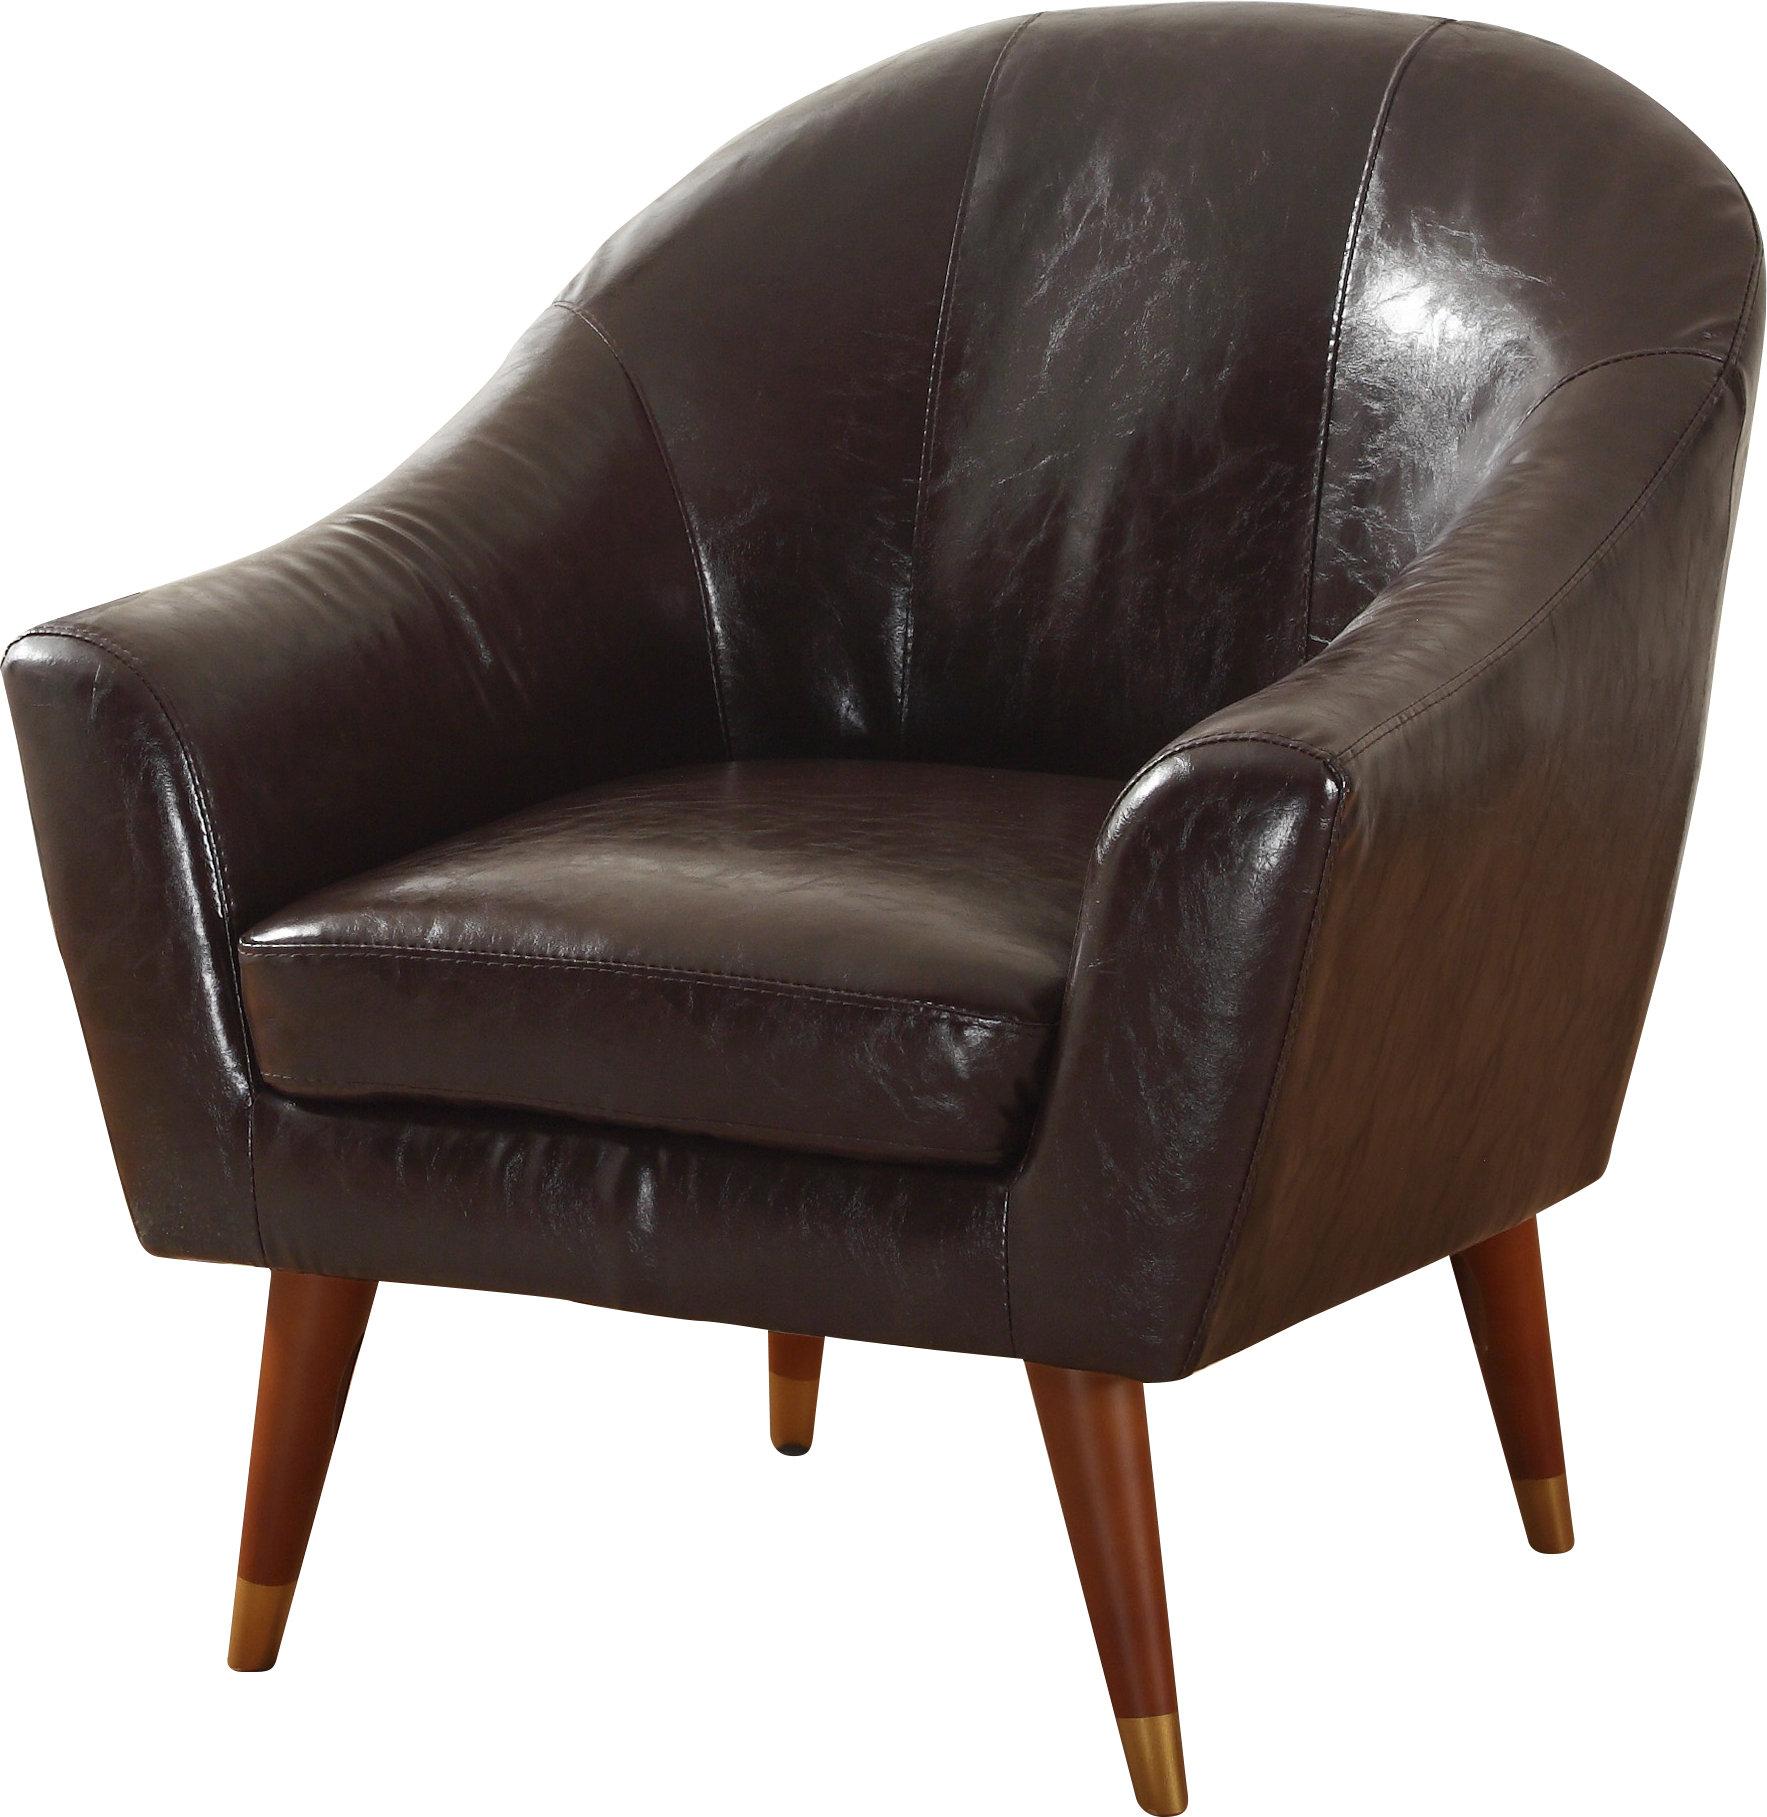 Exceptionnel Madison Home USA Mid Century Modern Barrel Chair U0026 Reviews | Wayfair